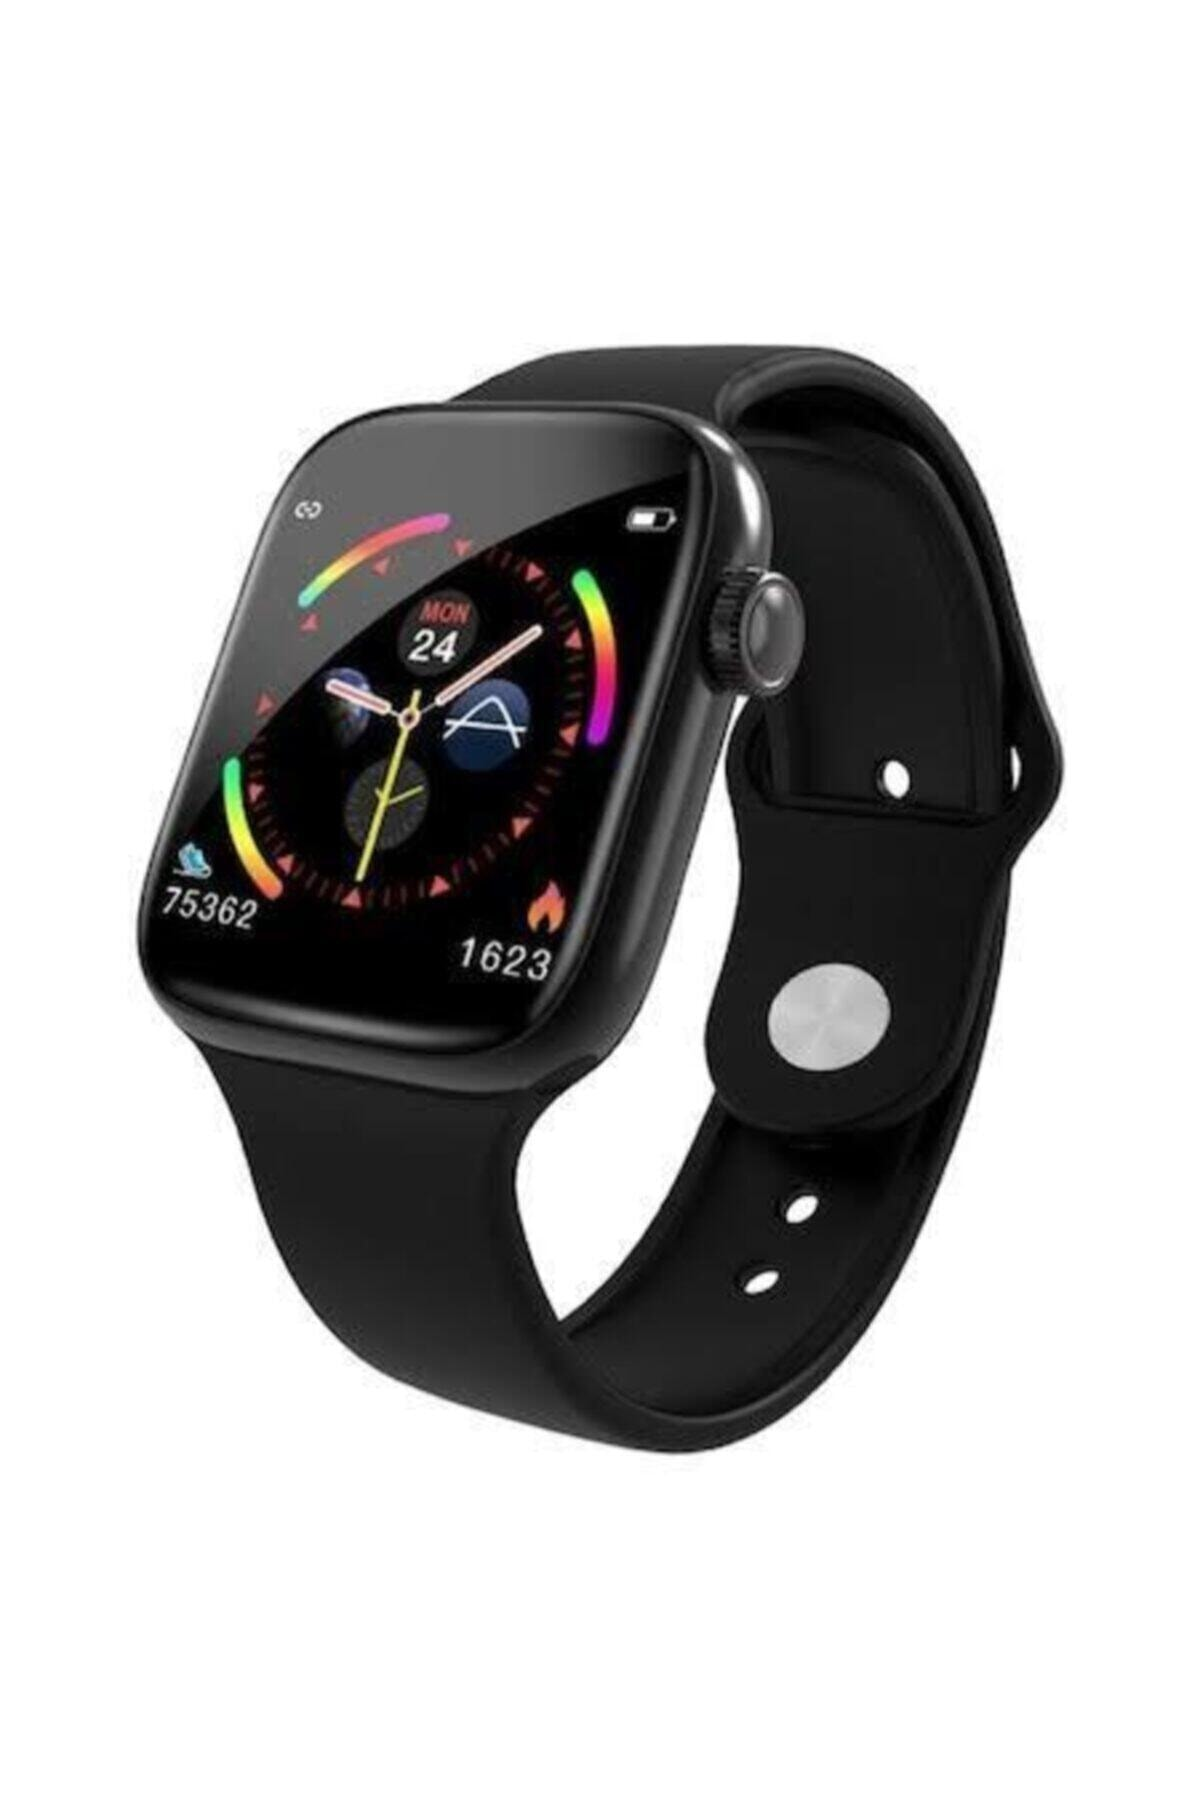 POLYGOLD W4 Akıllı Saat Smart Watch Dokunmatikli Ekran Adım Sayar 1